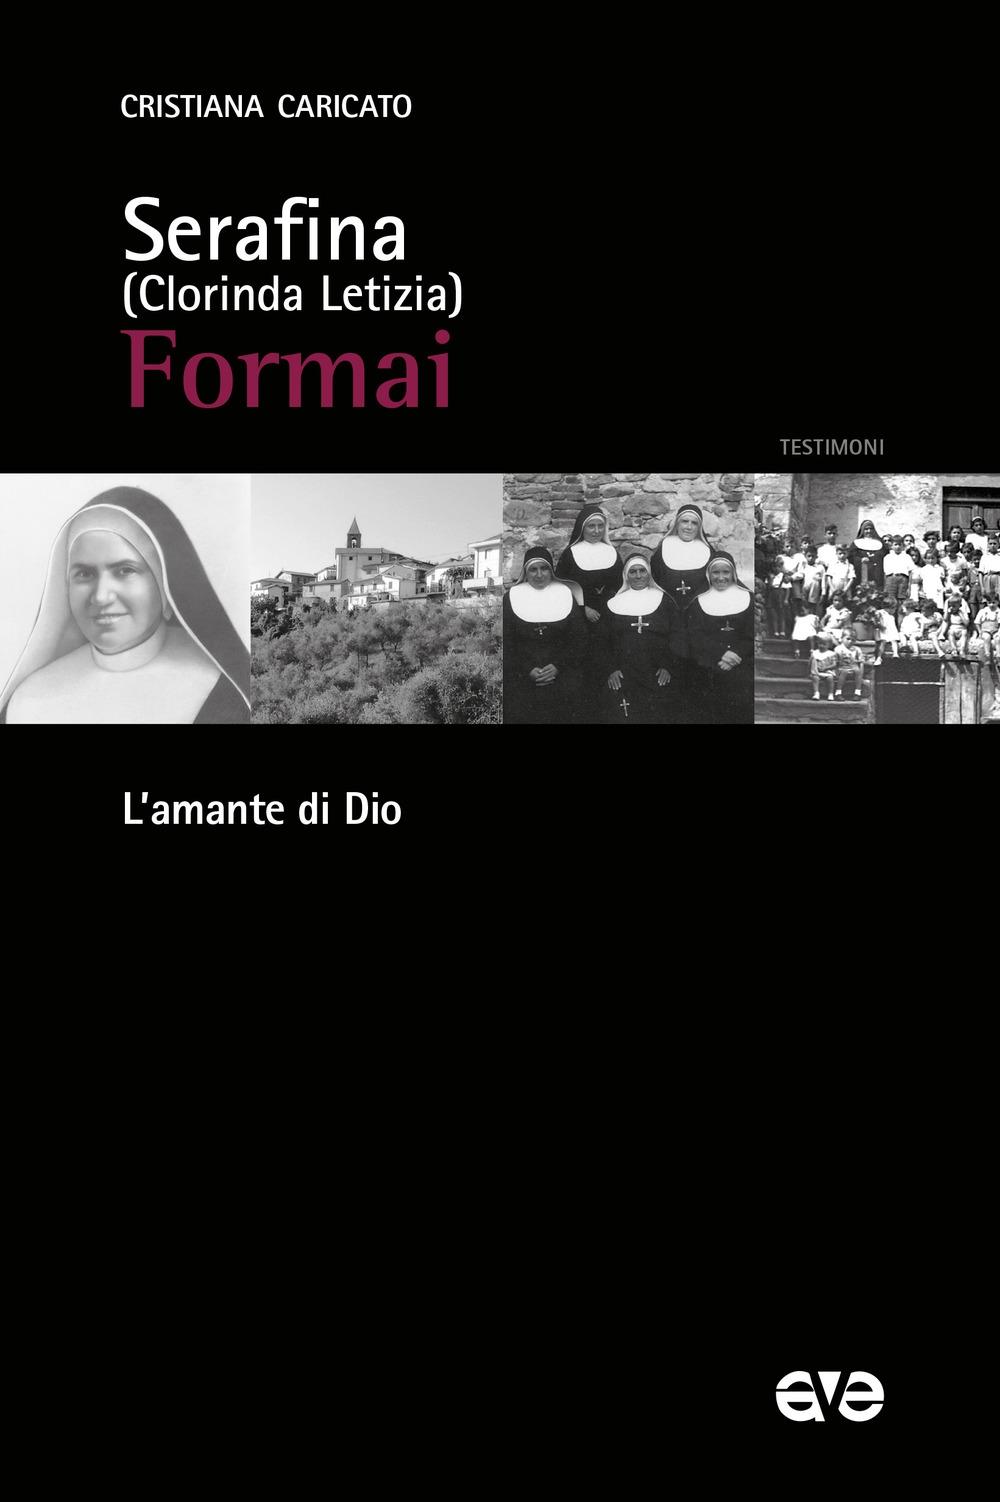 Serafina (Clorinda Letizia) Formai. L'amante di Dio